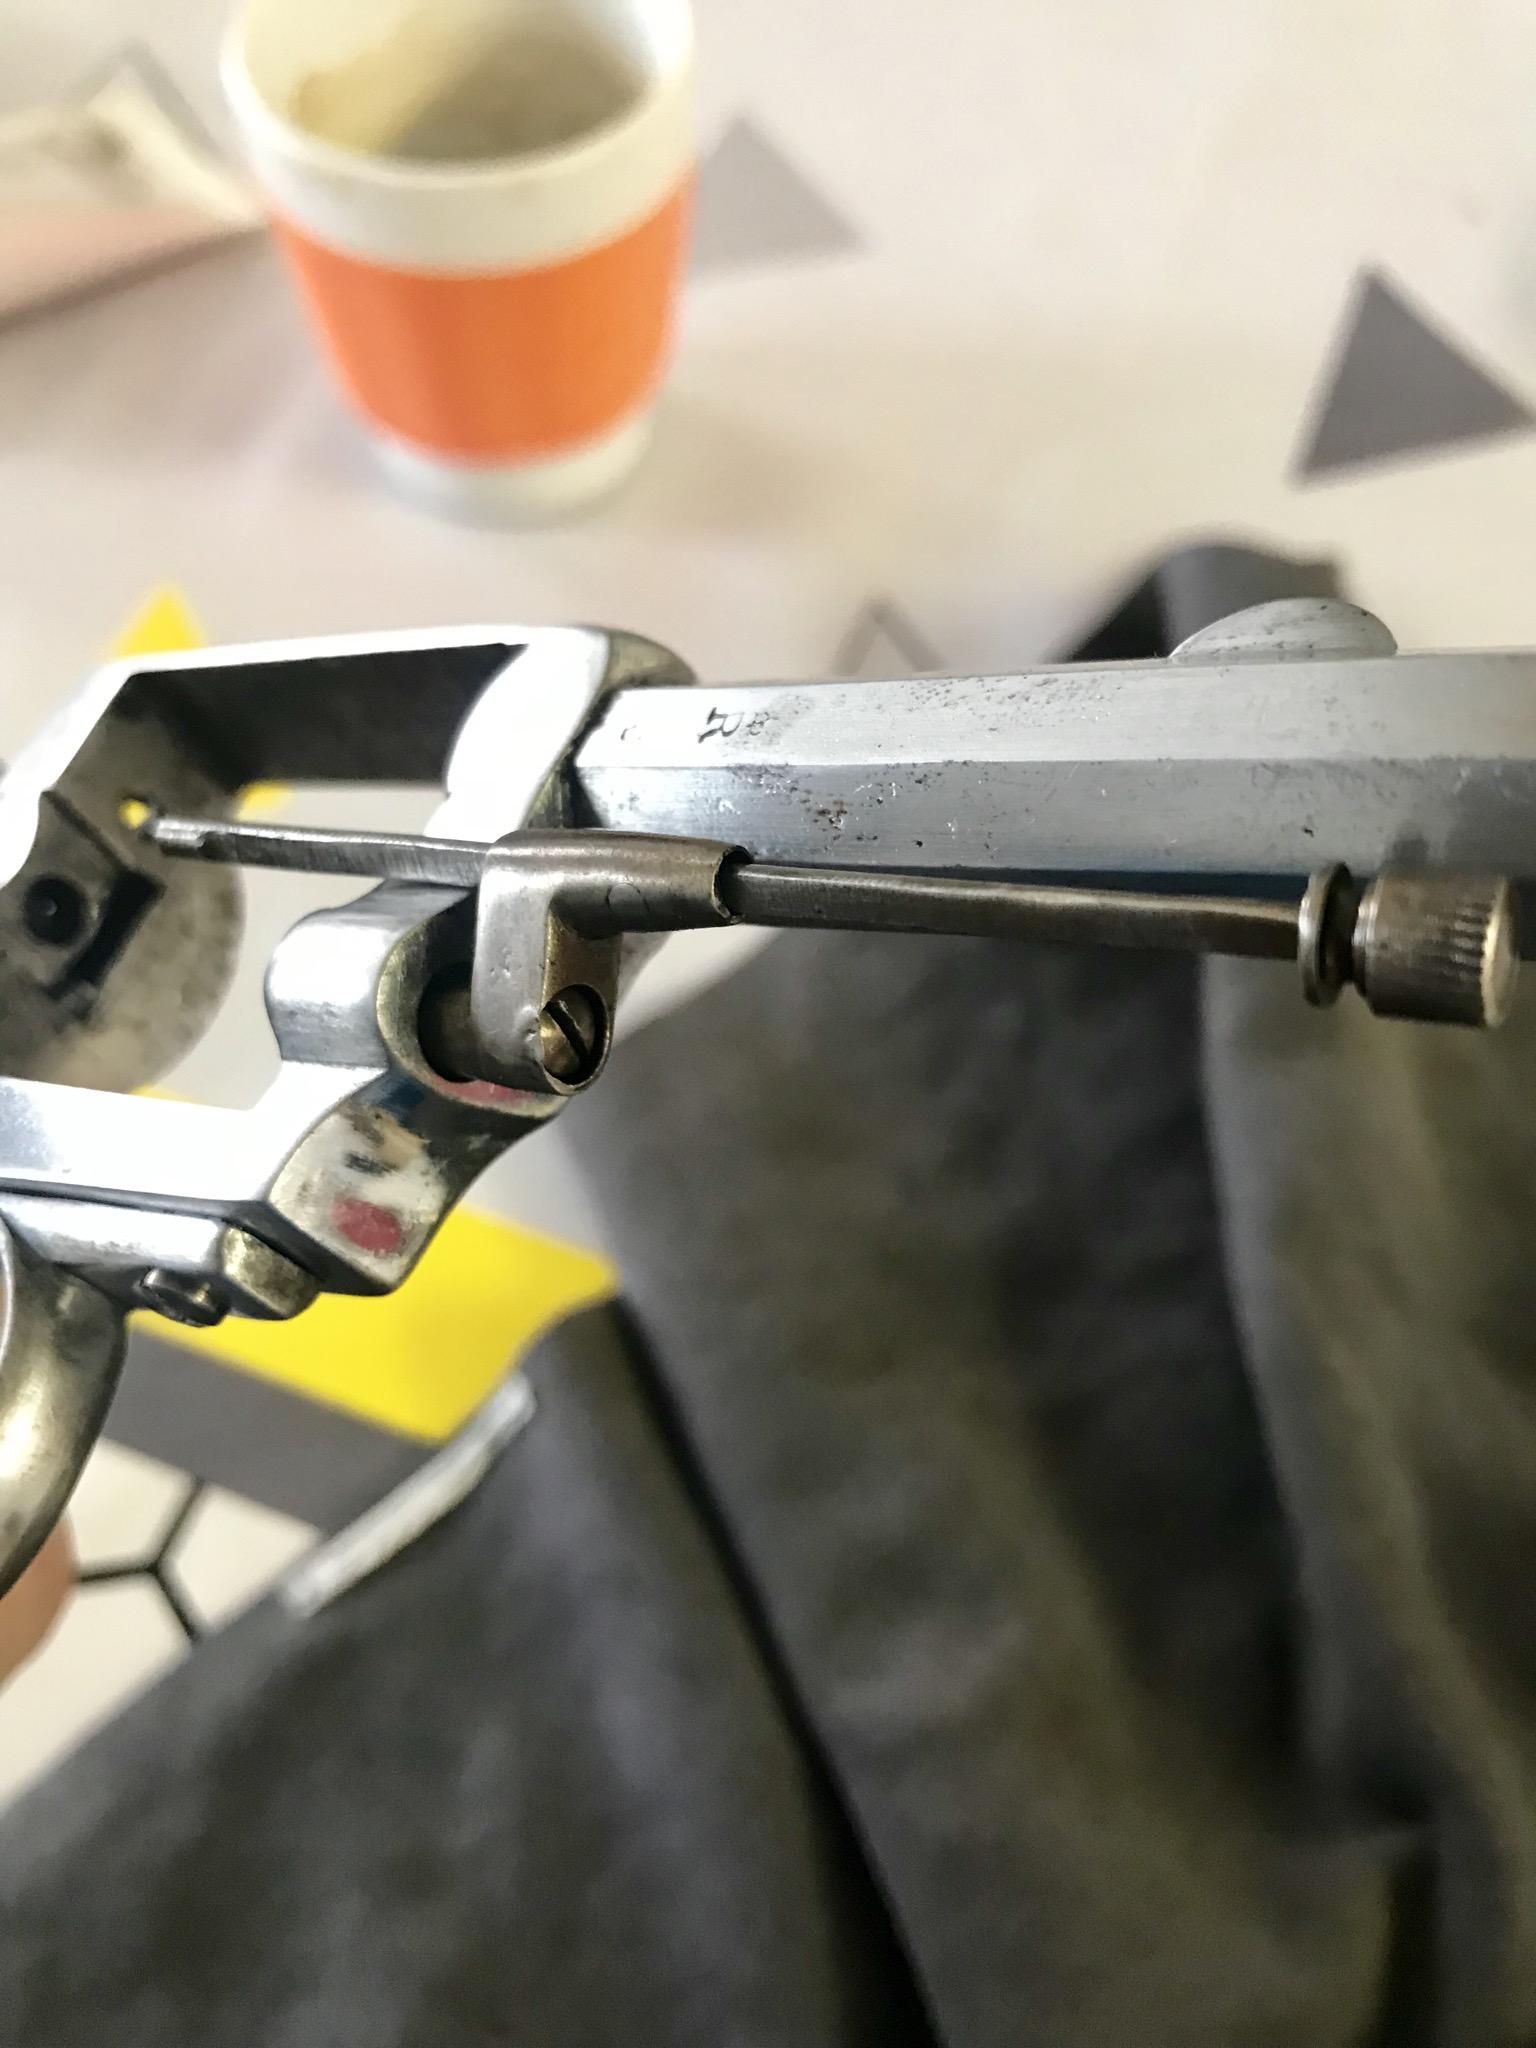 Tige d'extraction se bloque pas revolver type bulldog  Ac953410